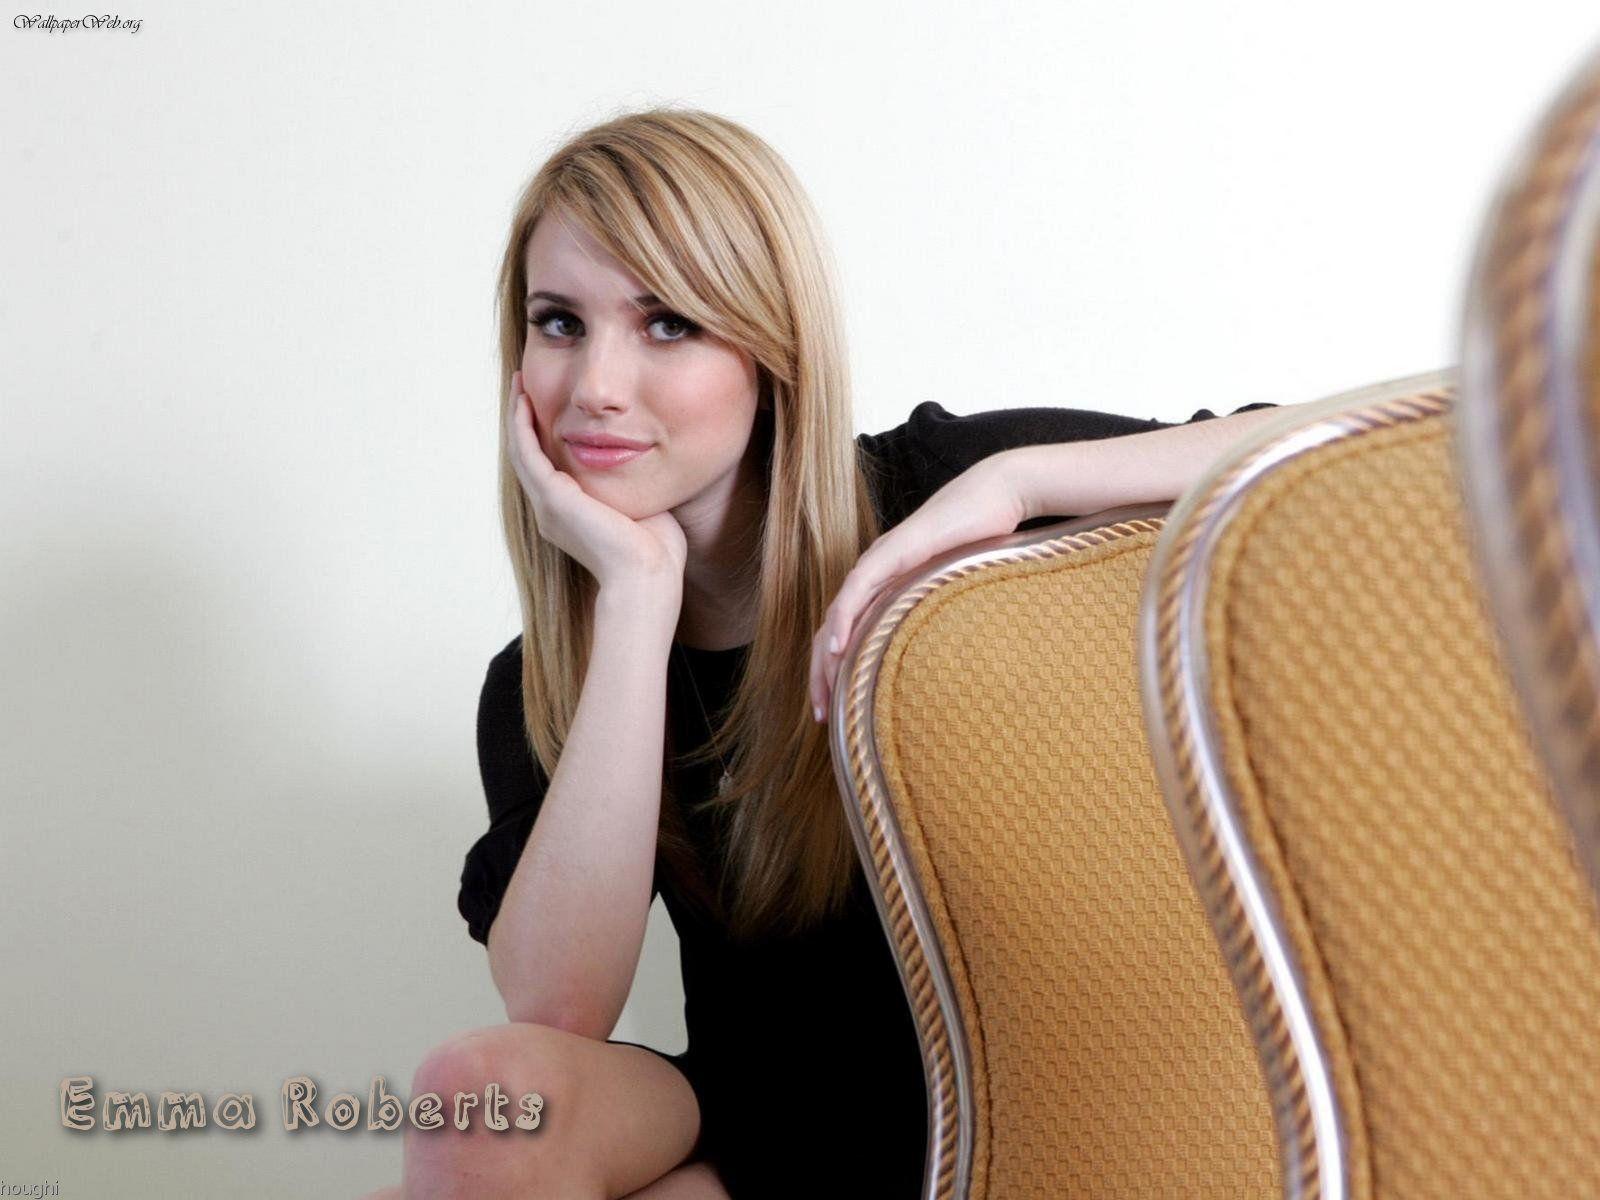 http://1.bp.blogspot.com/_WXShsNH9K2w/TAENR-867mI/AAAAAAAAA7c/yR4LgtZ1ick/s1600/e6.jpg